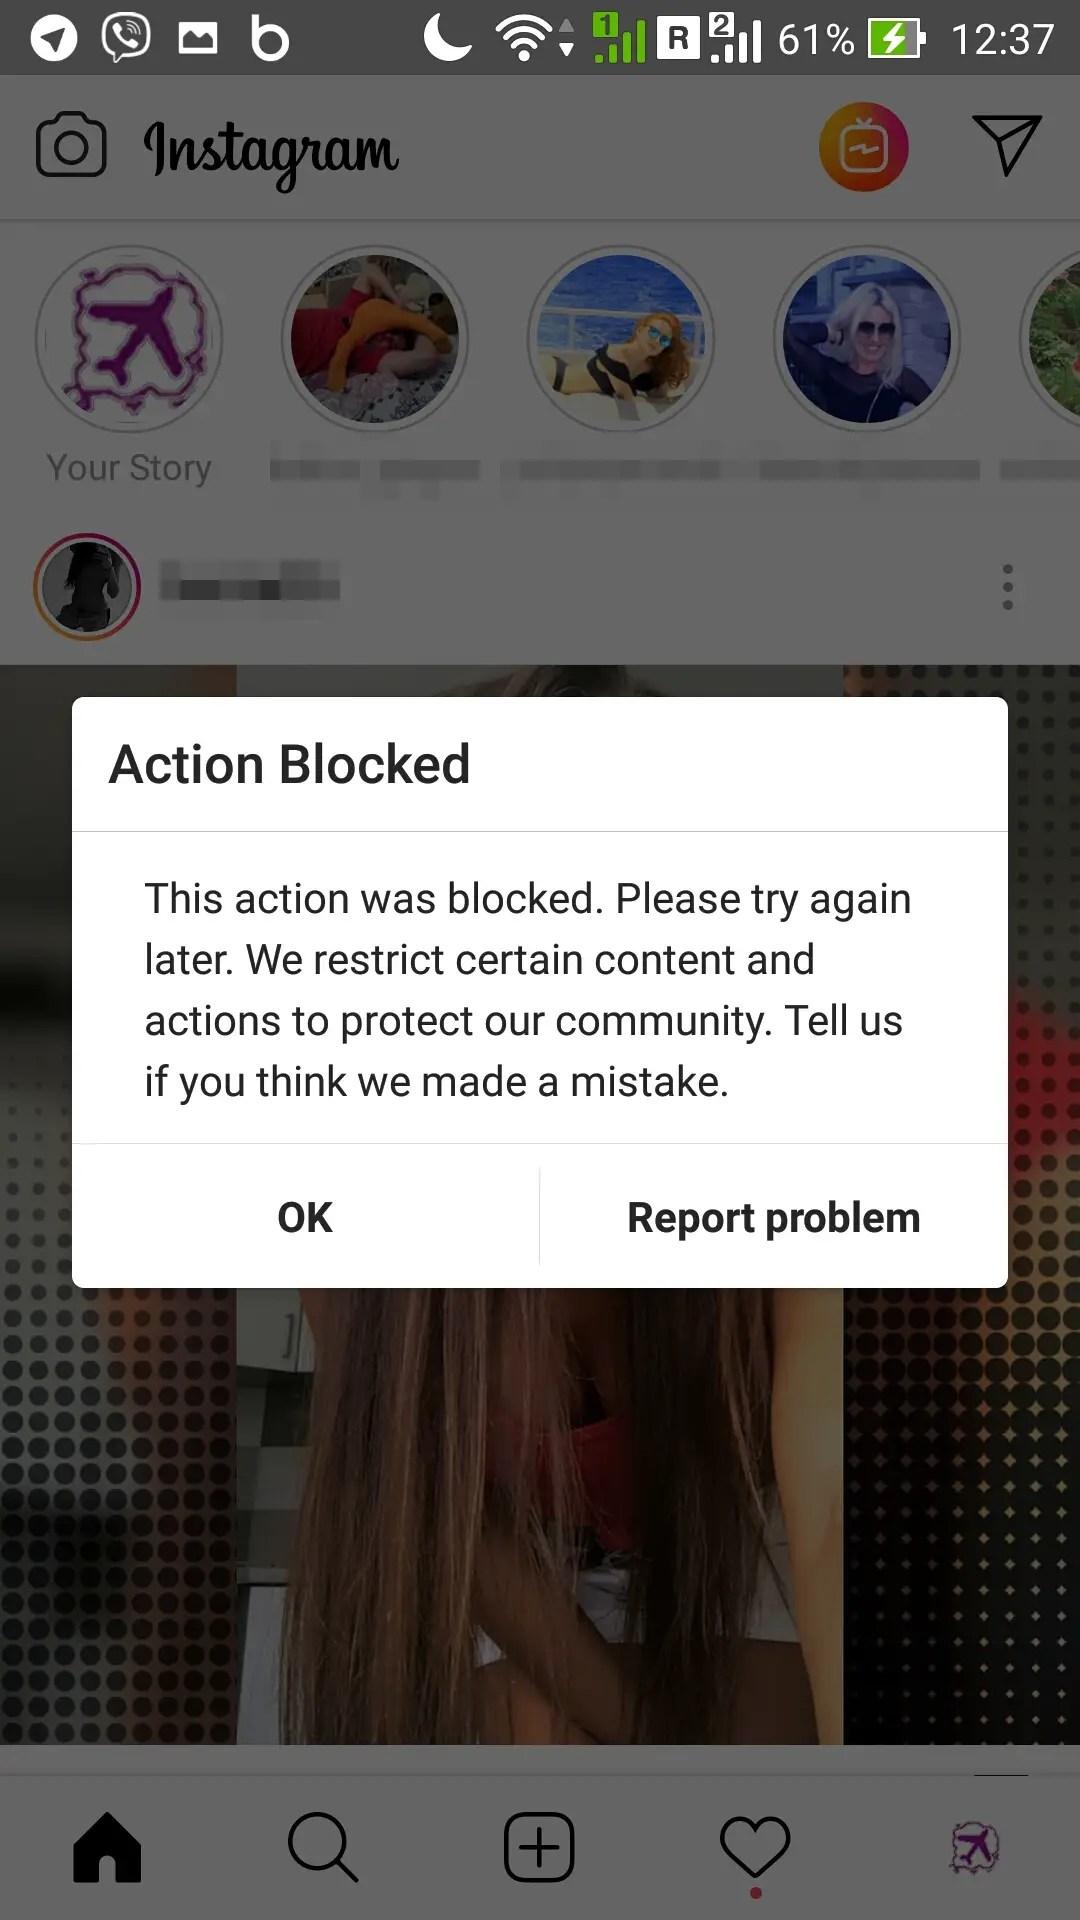 Instagram action blocked : Instagram temporarily blocked